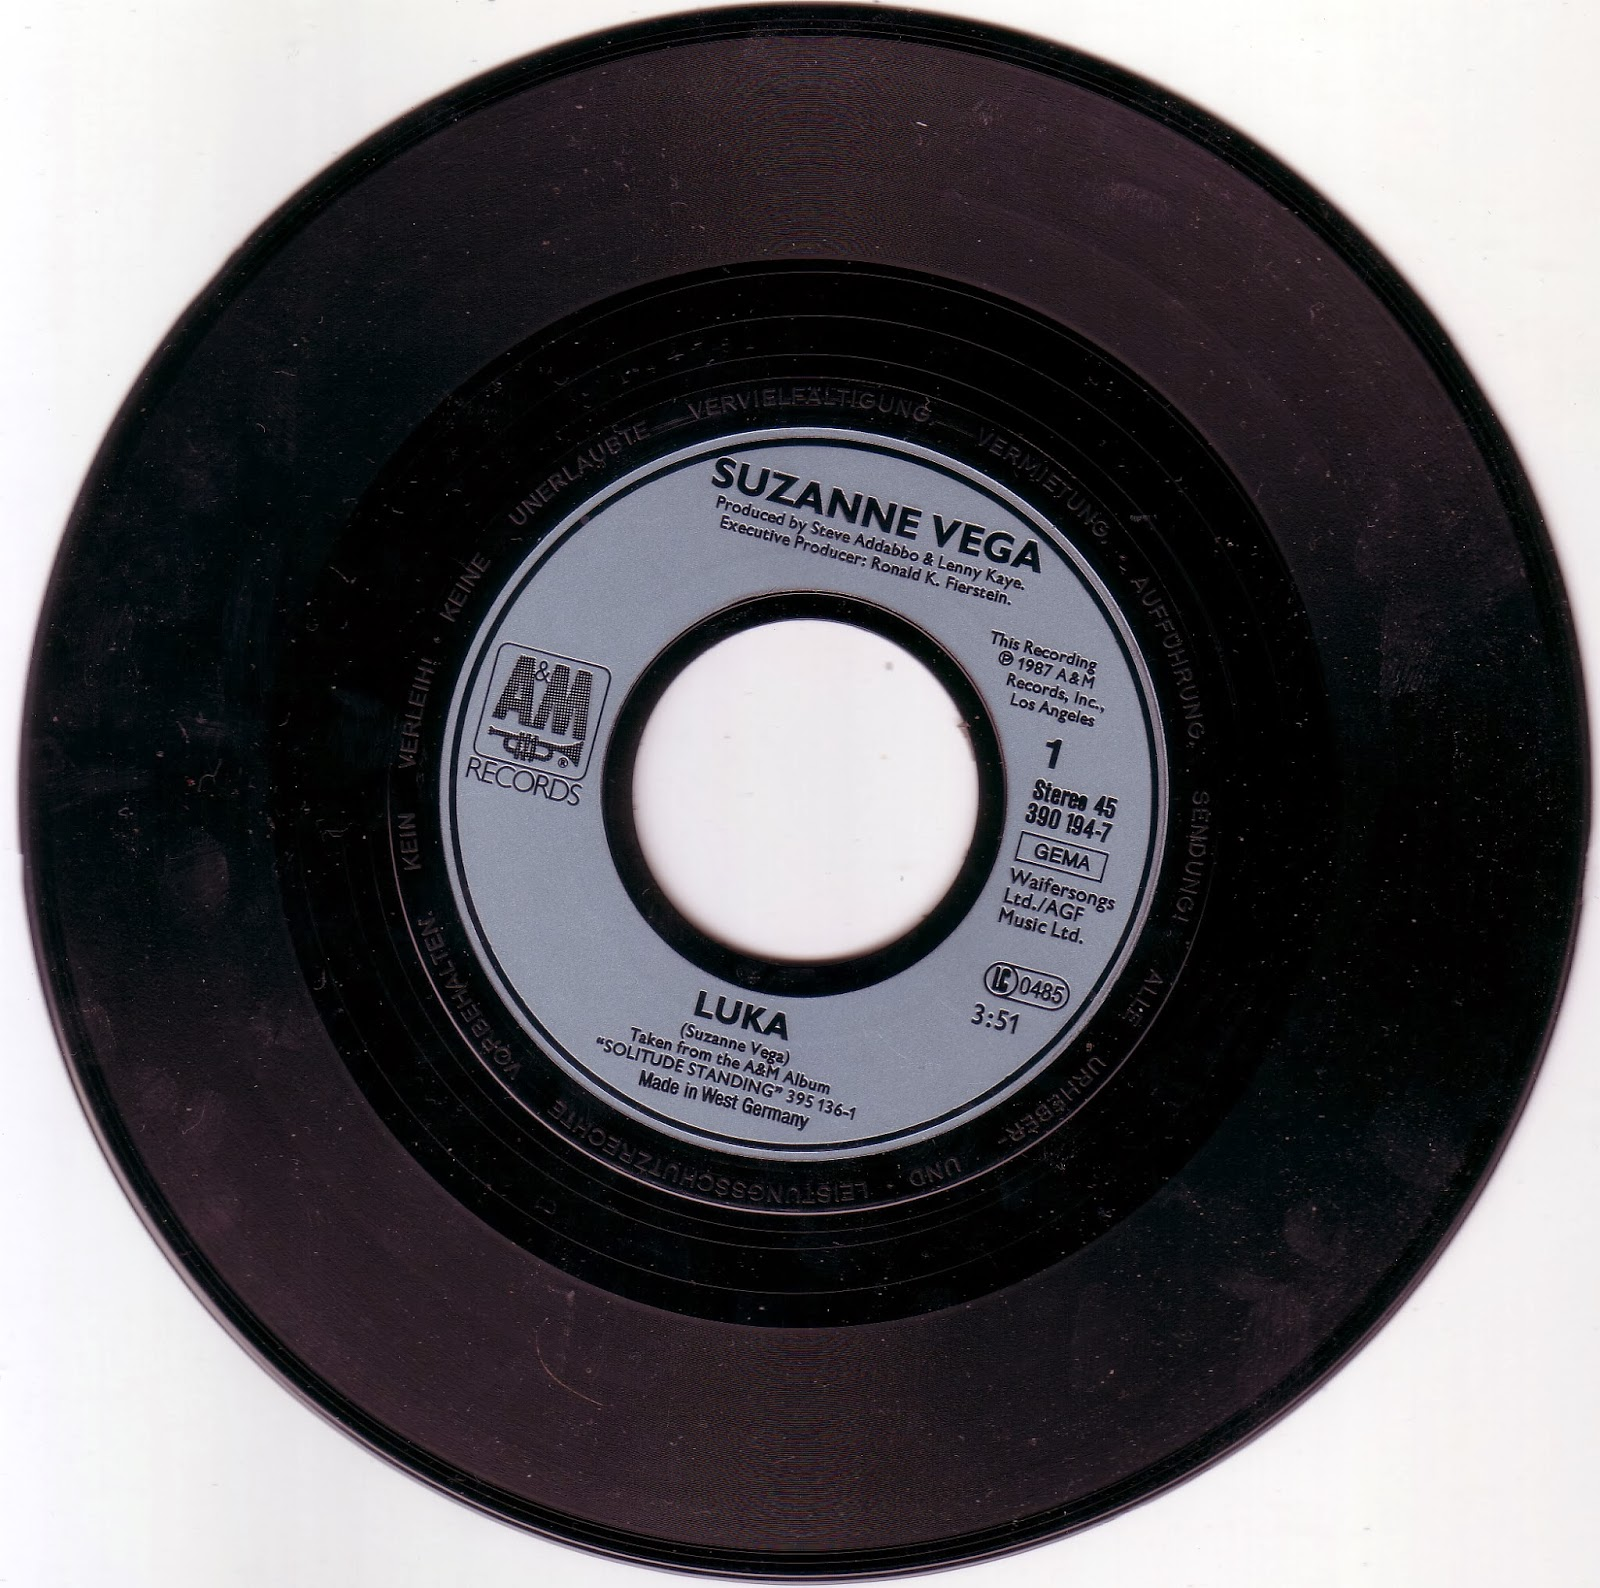 Vinyl Singlar Suzanne Vega Luka 1987